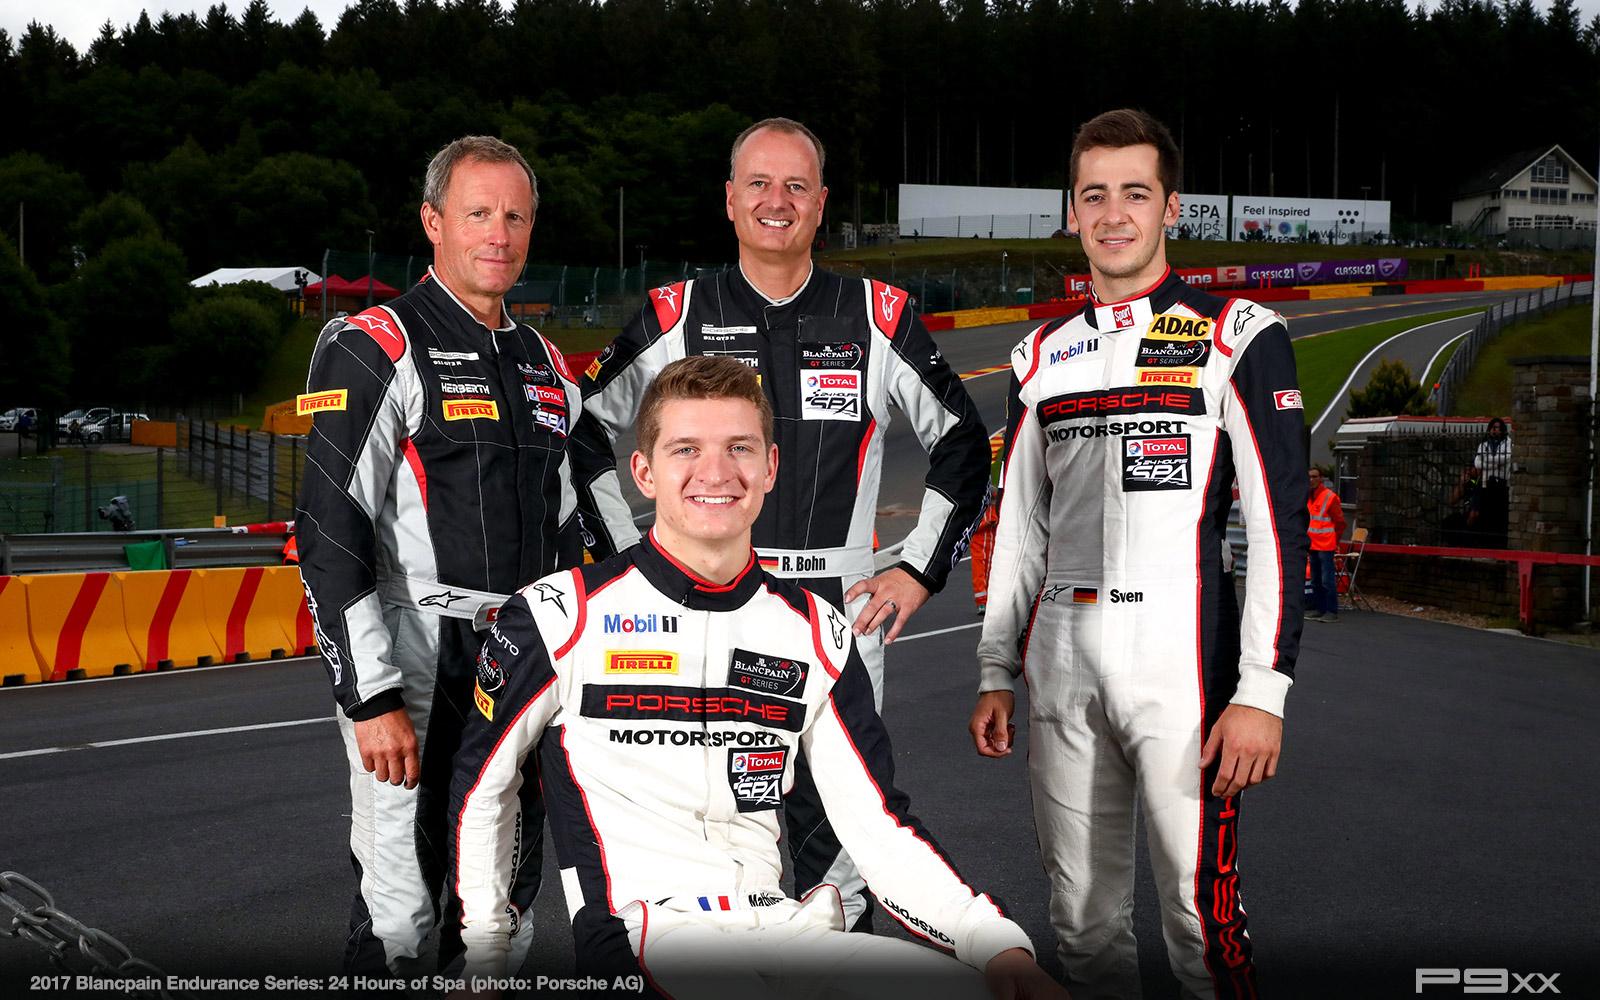 2017-24-Hours-of-Spa-Porsche-344